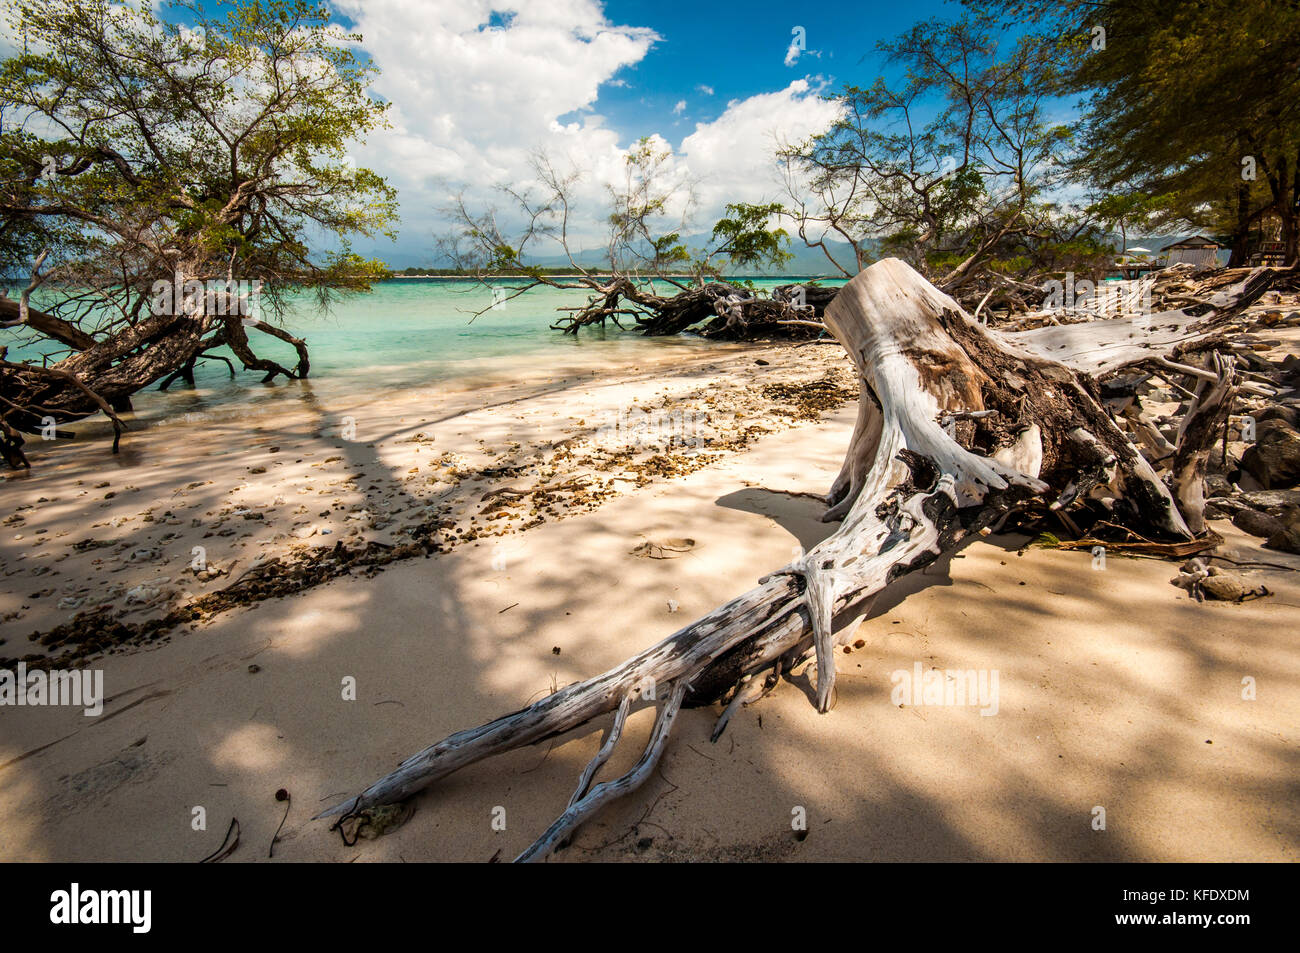 Gili Meno beach, Lombok, Indonesia - Stock Image